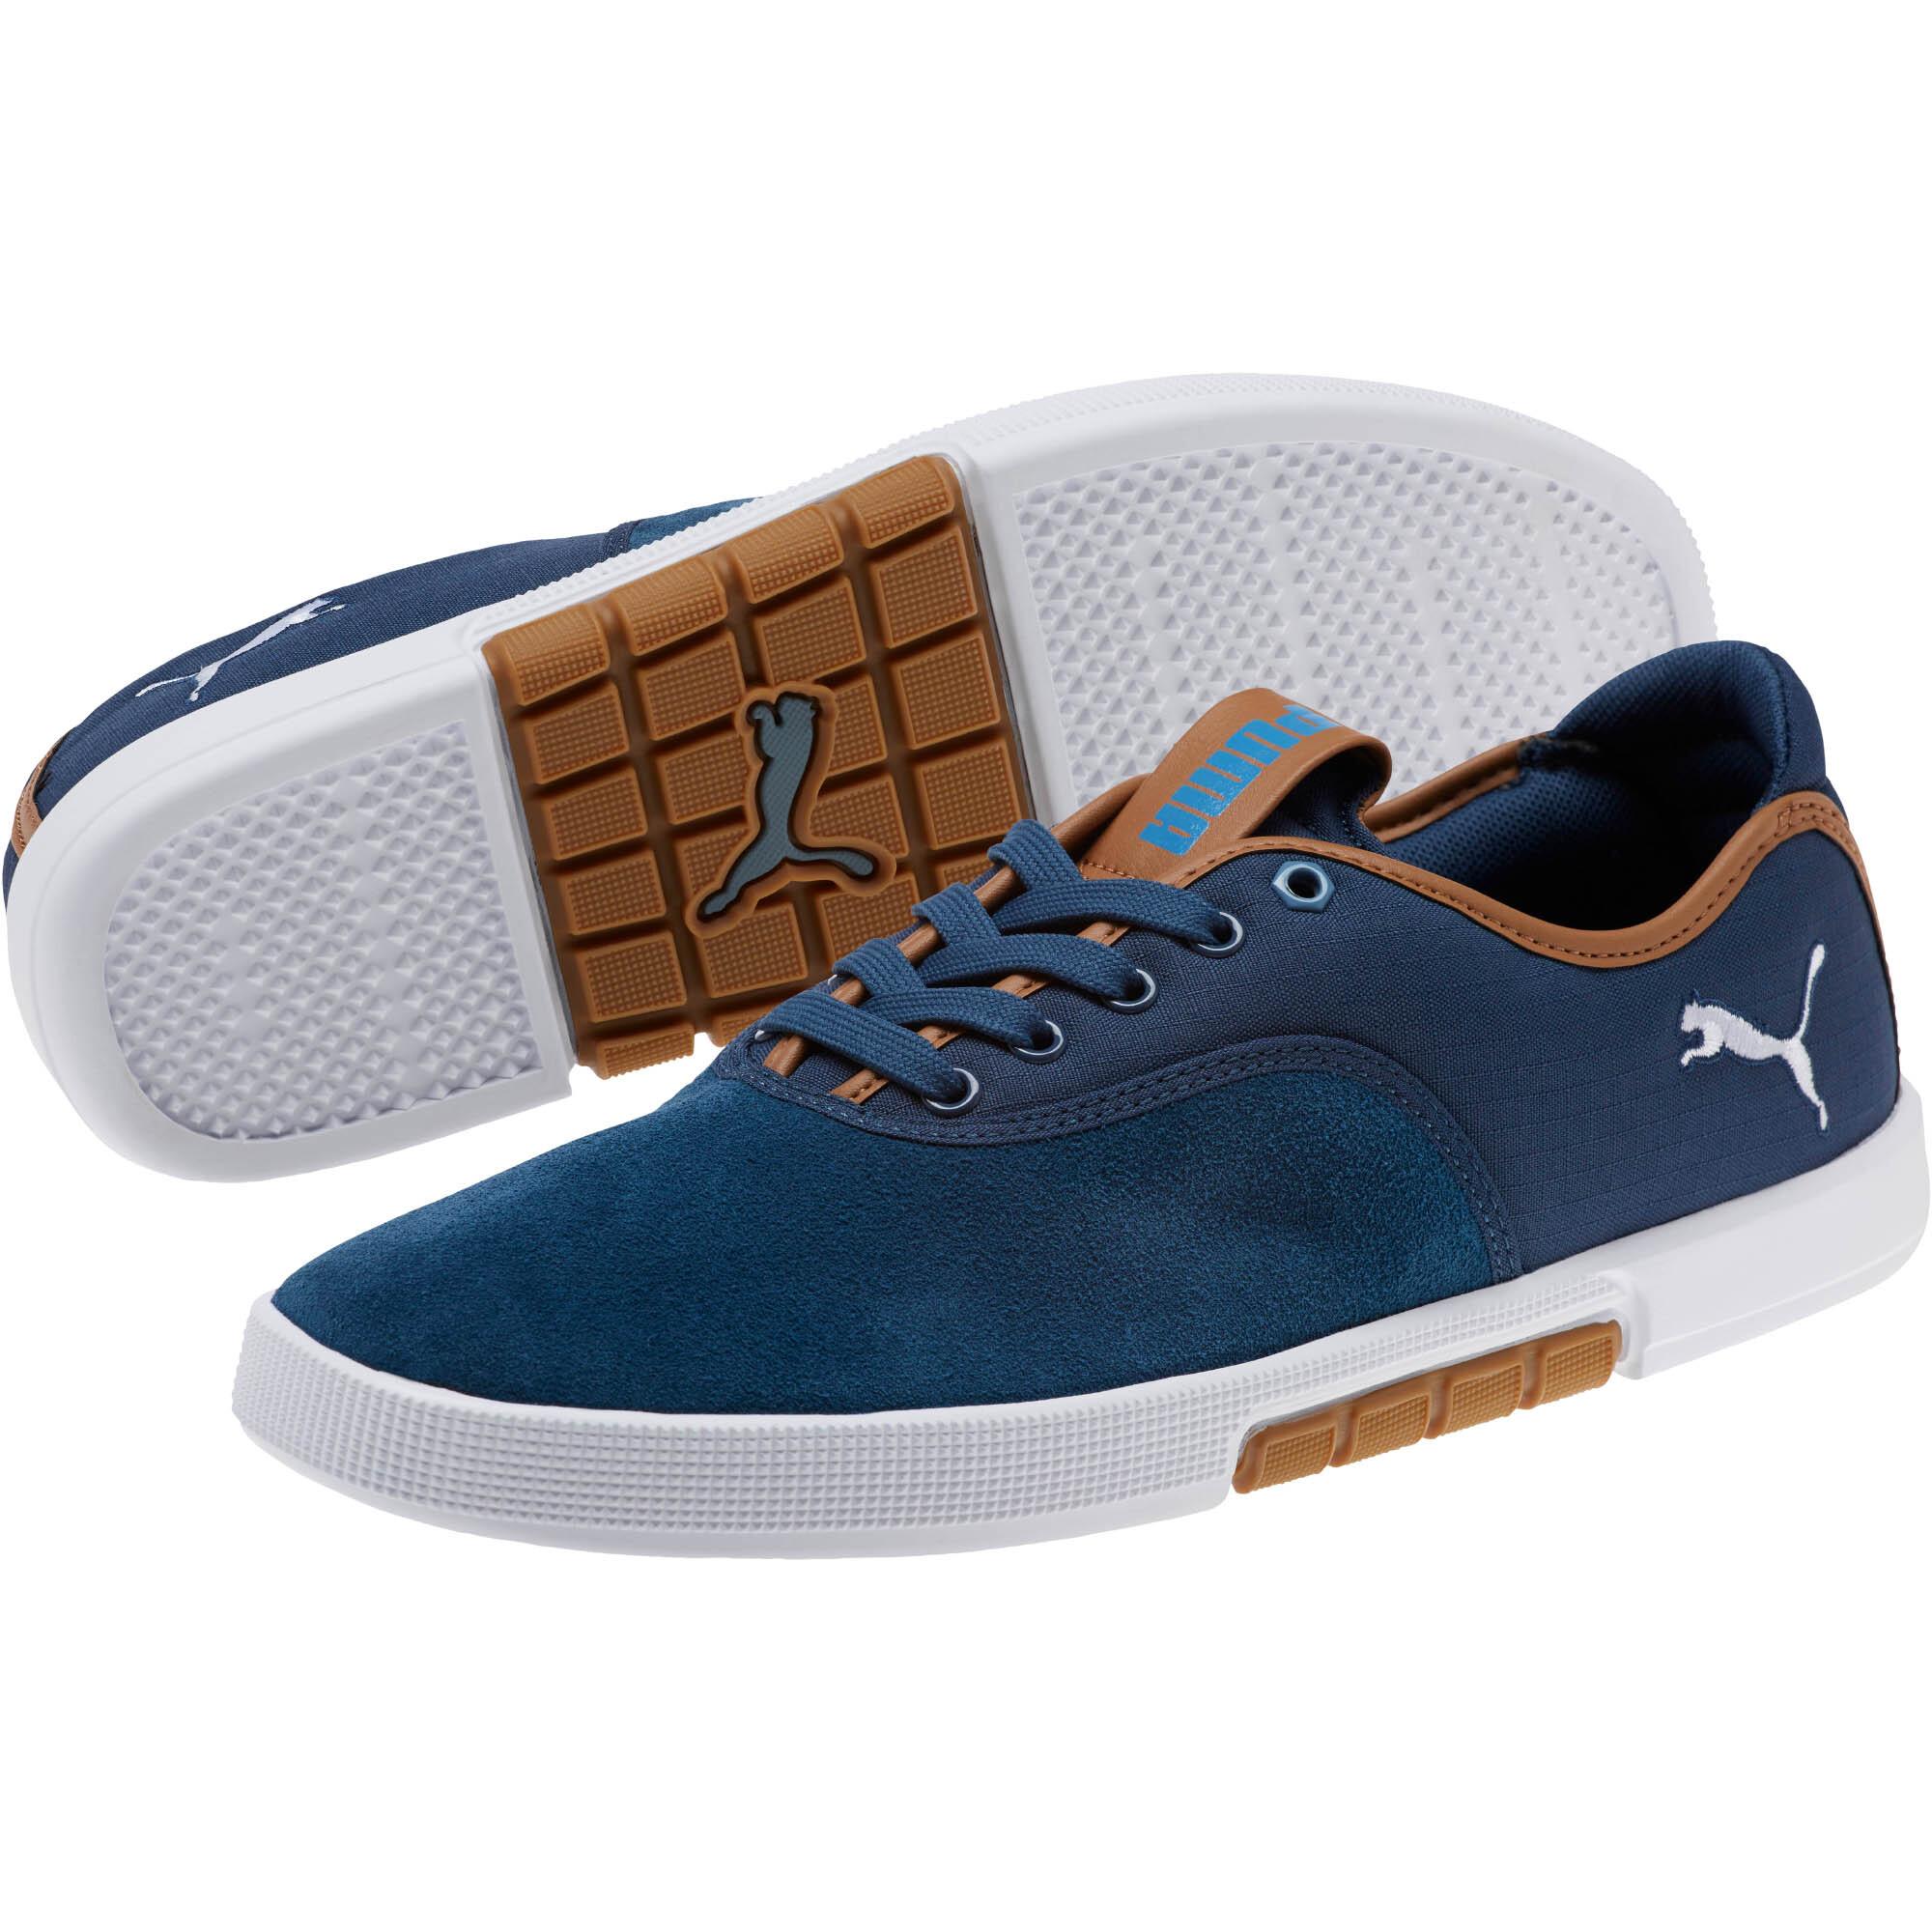 PUMA-Funist-Lo-MU-Men-039-s-Sneakers-Men-Shoe-Evolution thumbnail 14